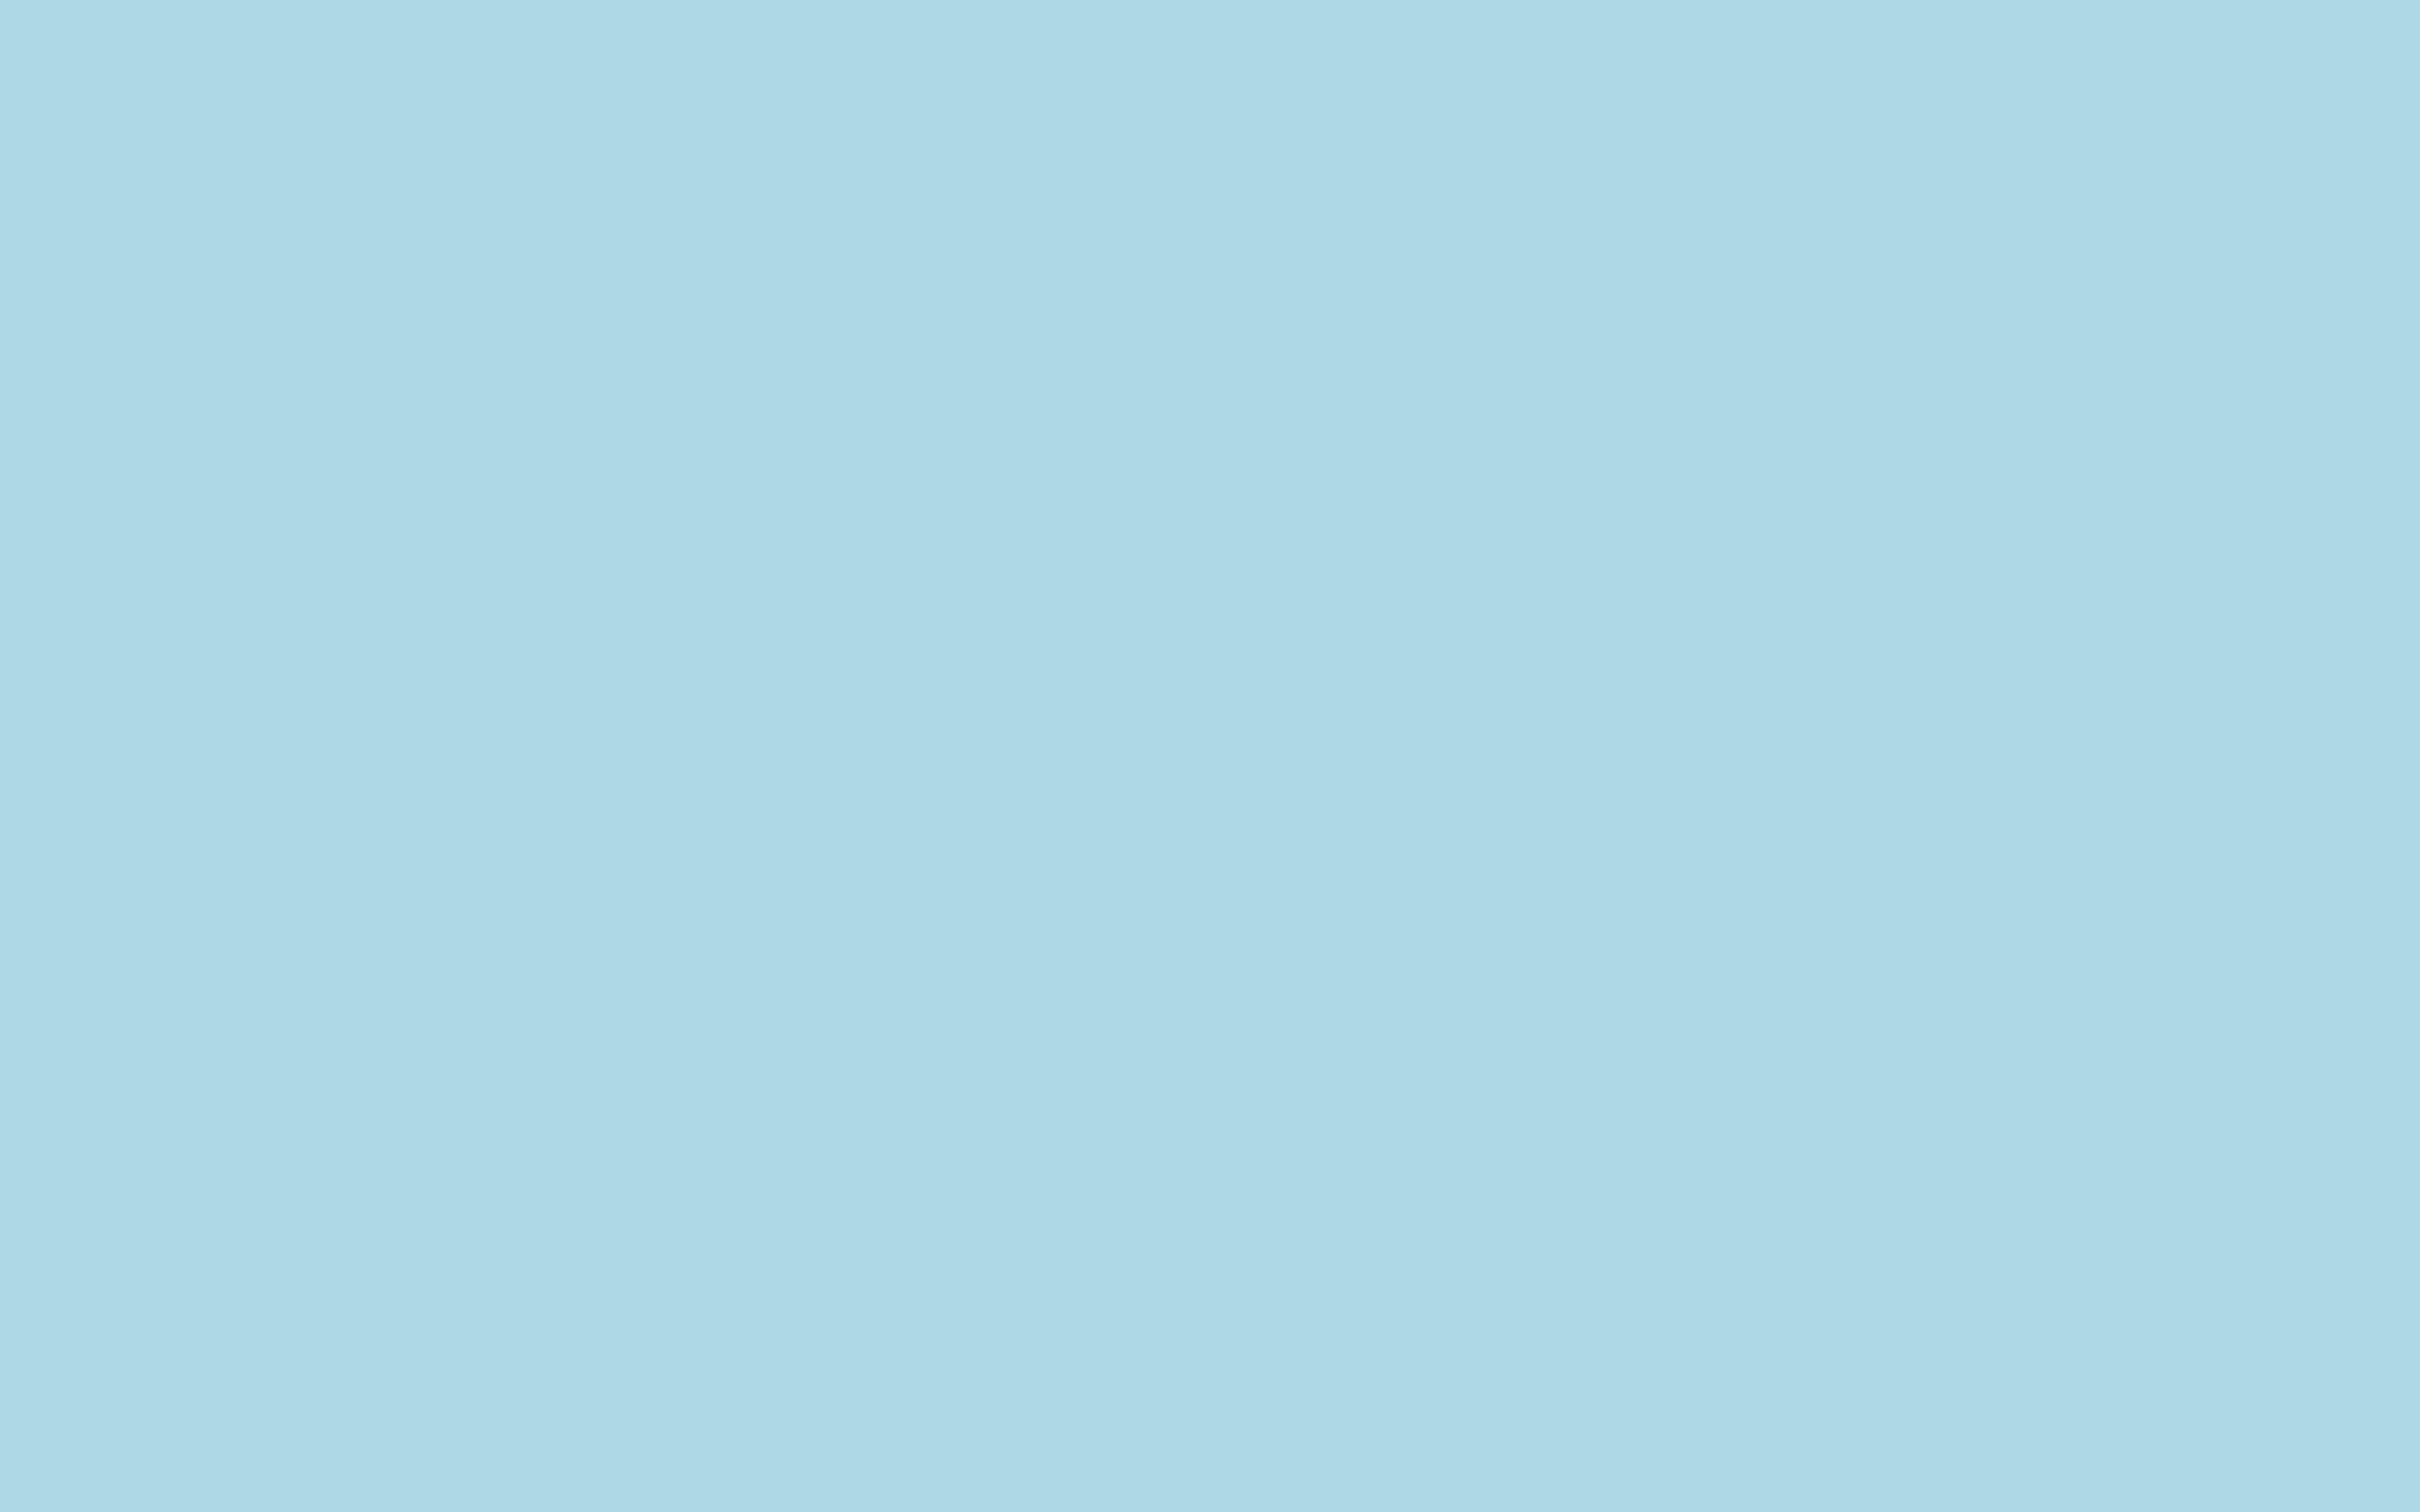 … light blue solid color background jpg advanced home …